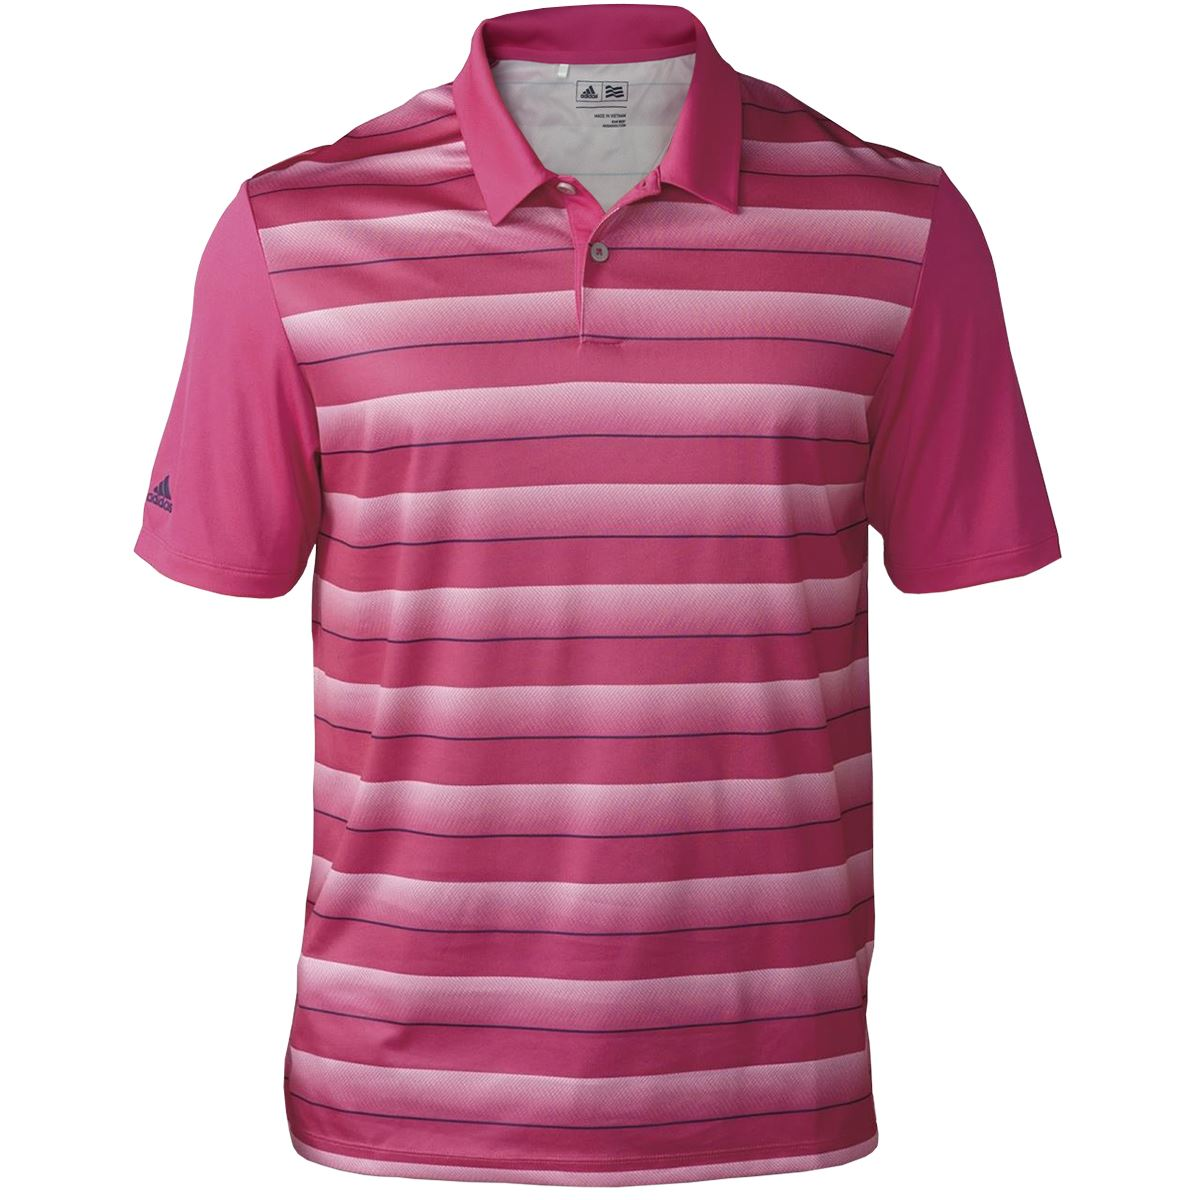 2016 Adidas Mens Performance Striped Golf Polo Shirt Ebay